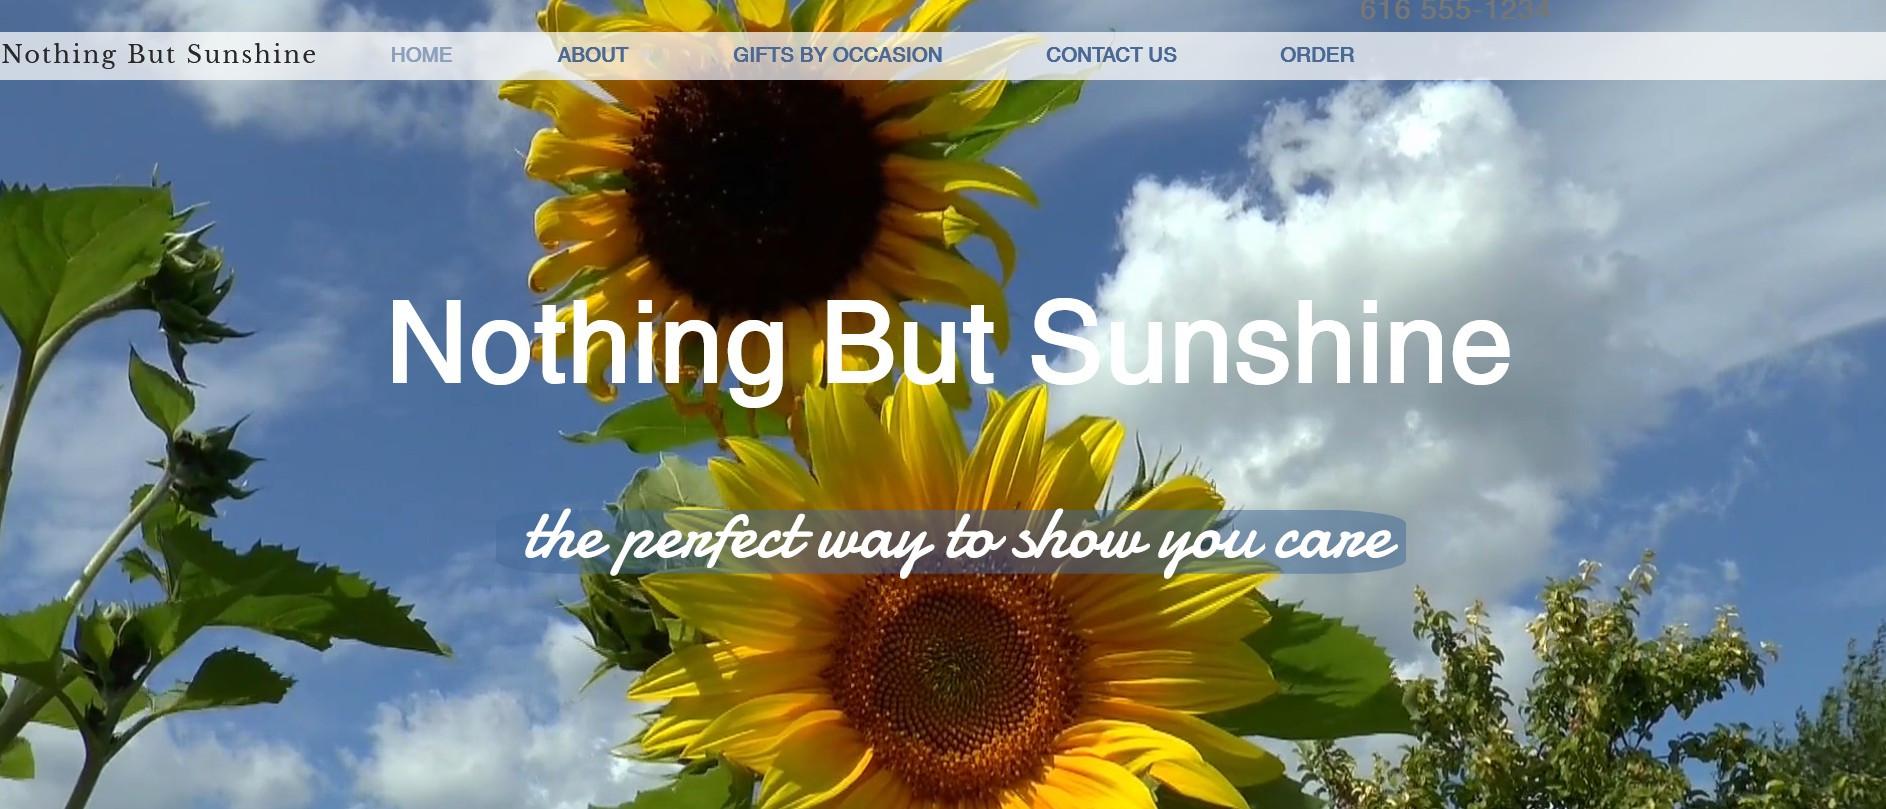 Nothing But Sunshine- International Gift Boutique